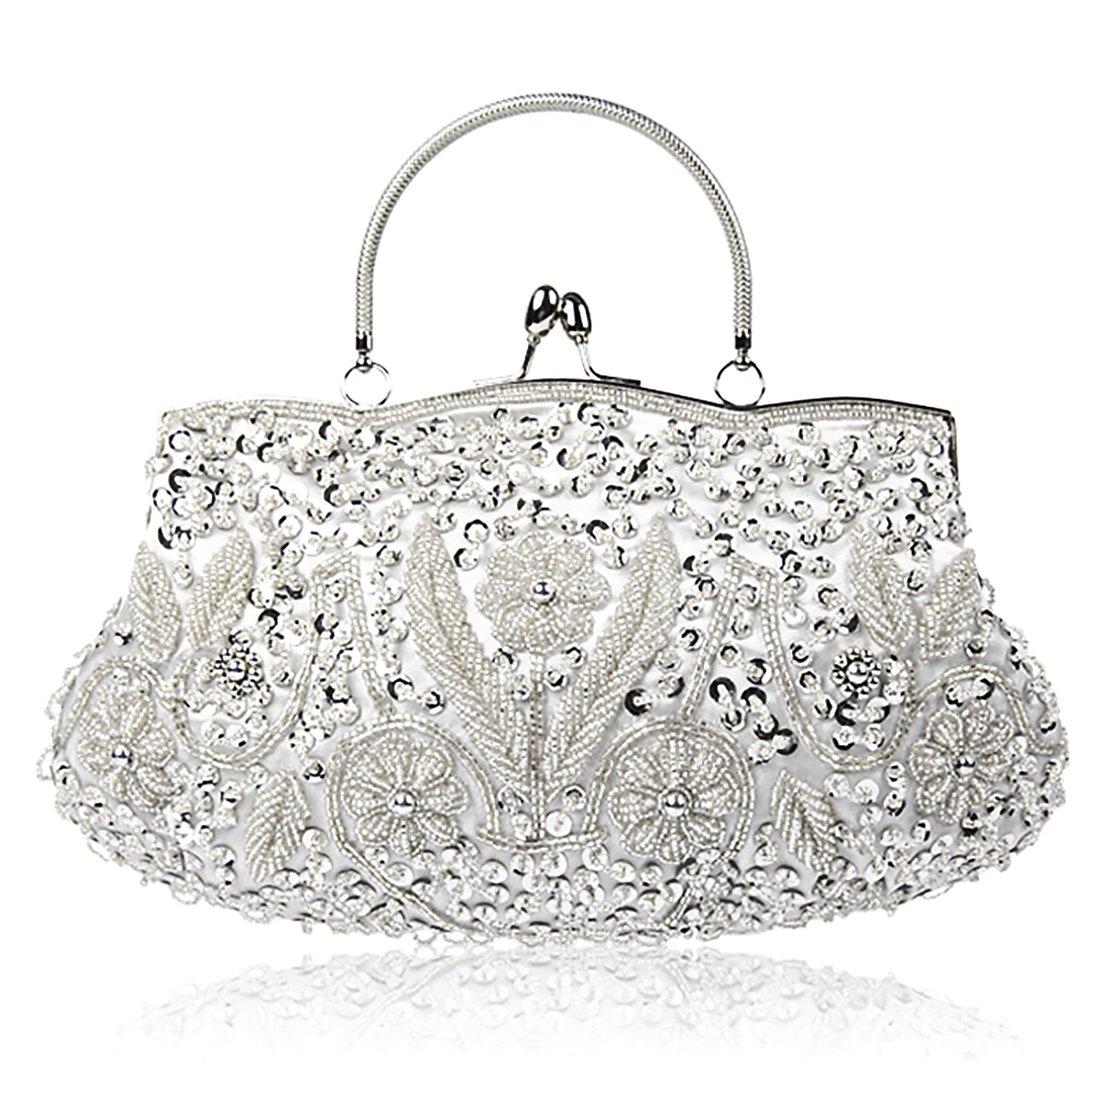 KNUS Beaded Sequin Design Evening Bag Wedding Party Handbag Large Clutch Purse (Silver)